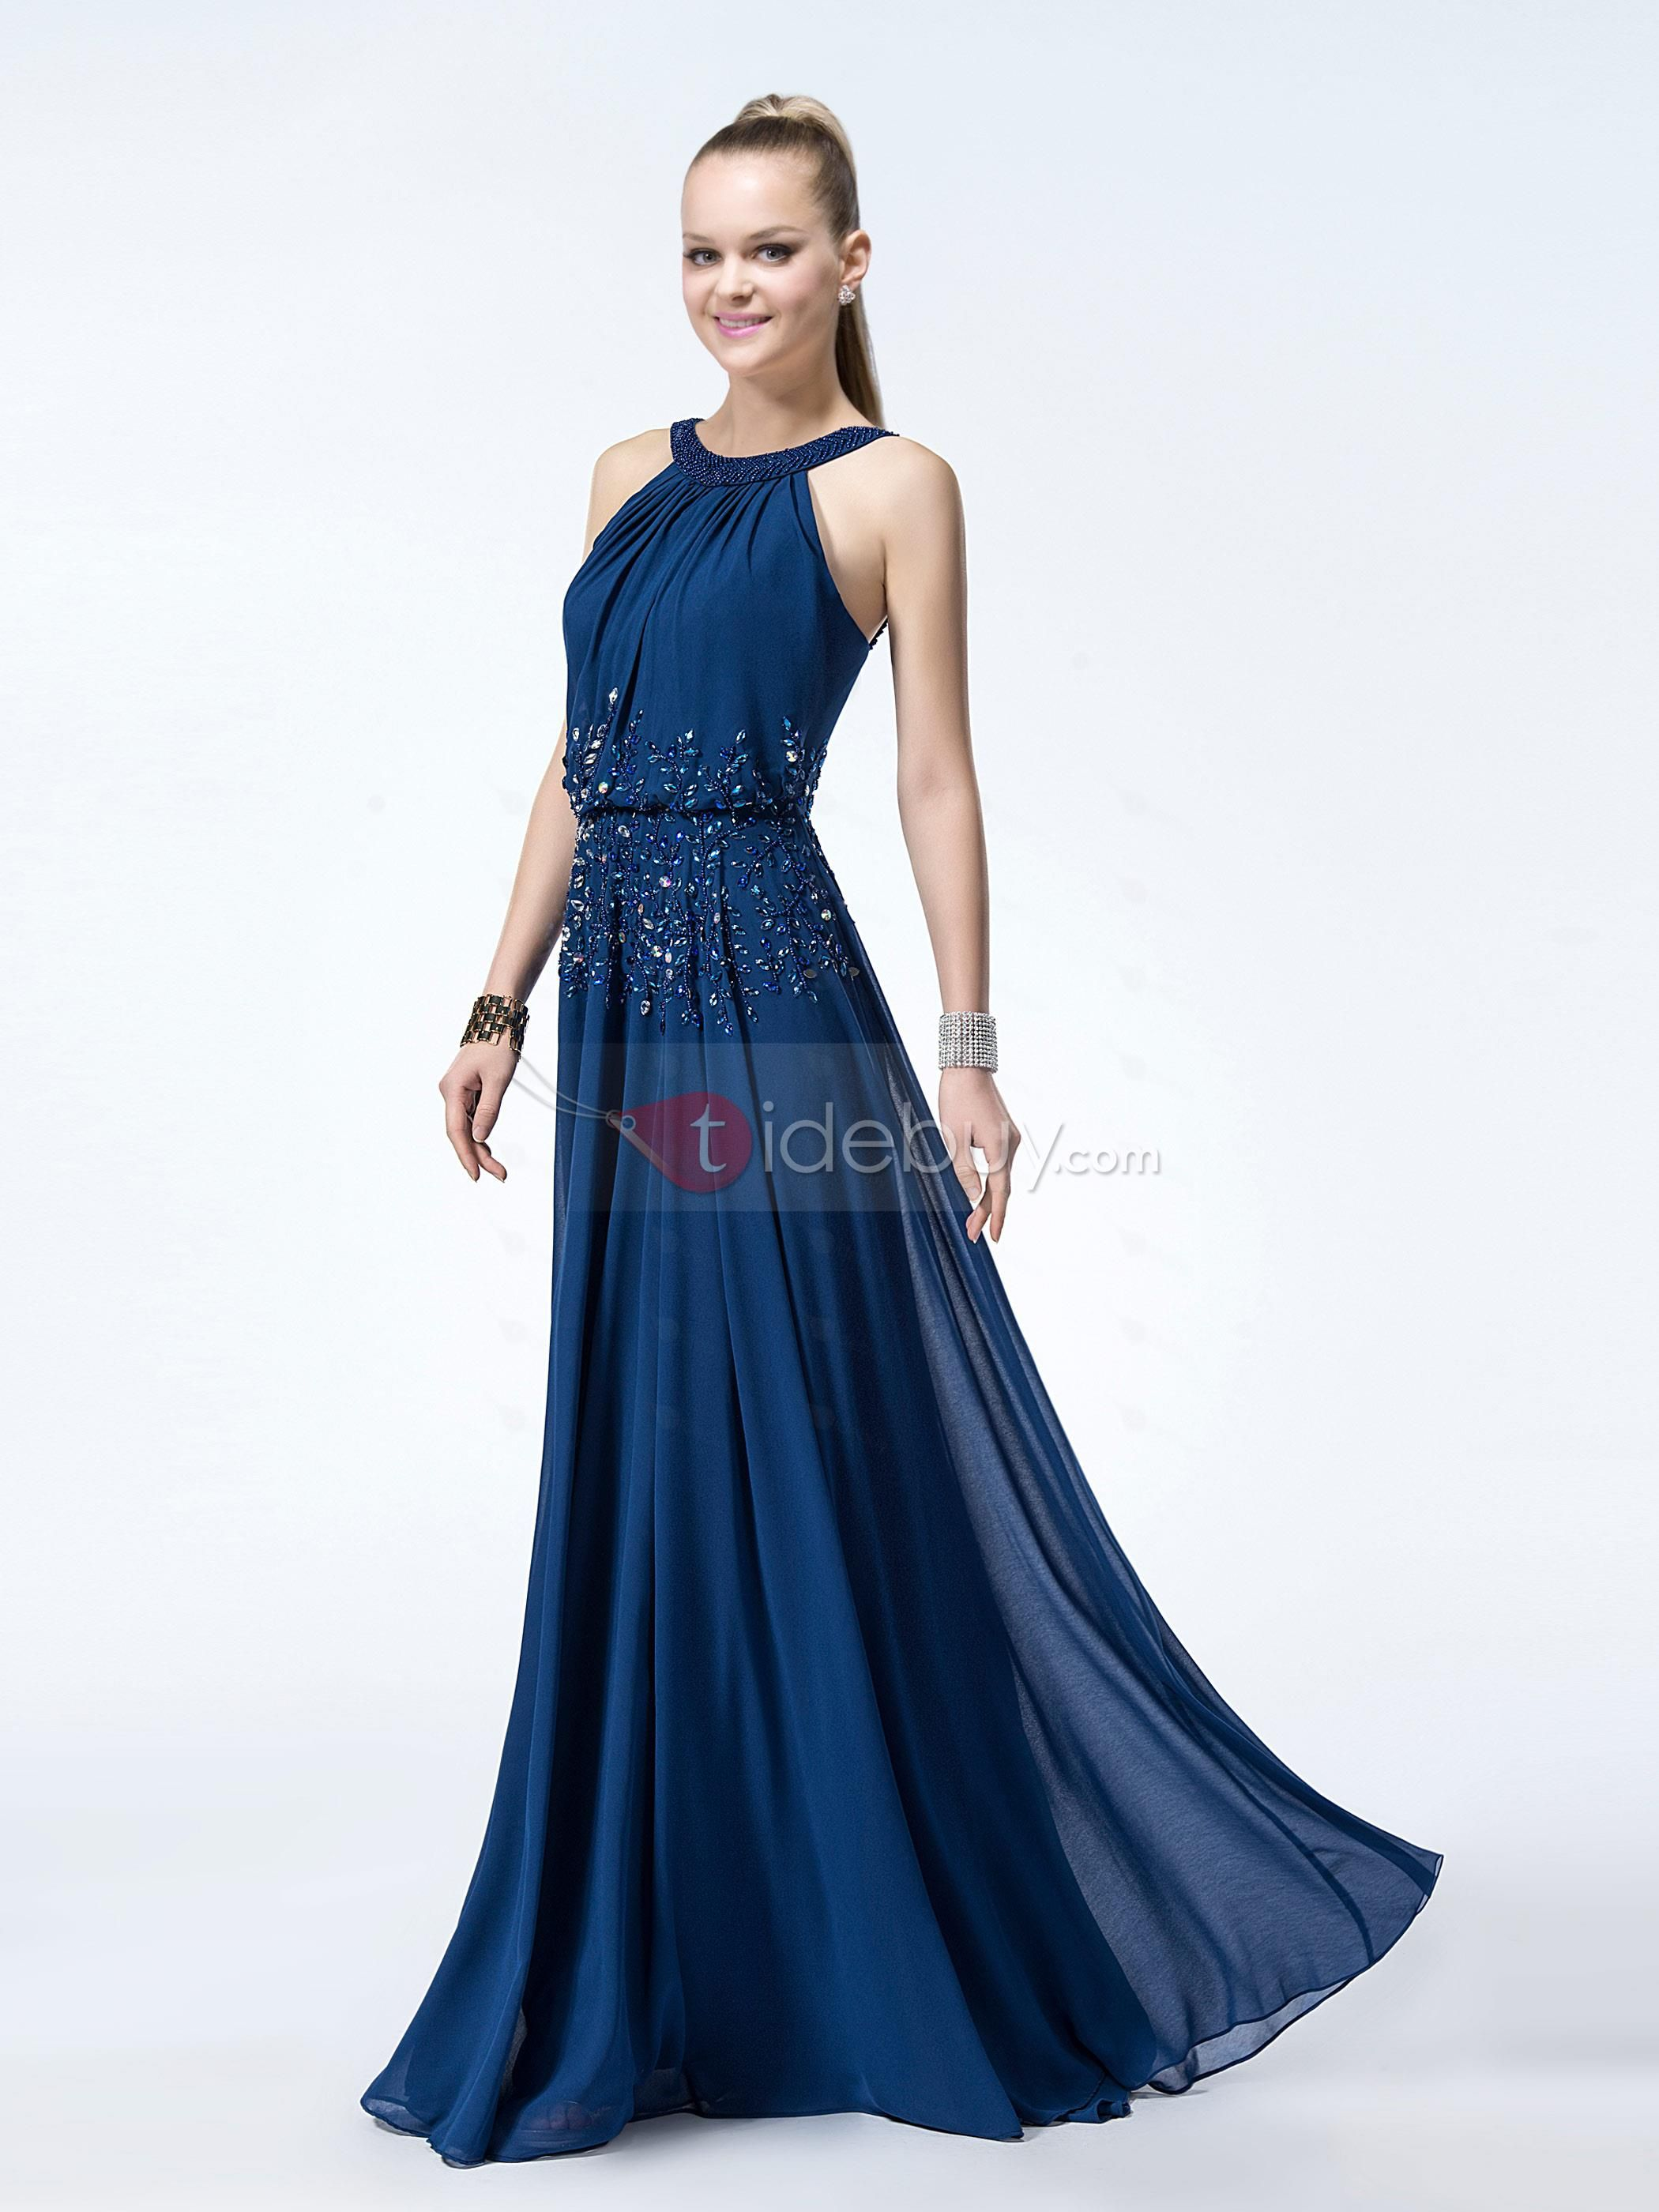 Stunning A-Line Beading Dropped Waistline Floor-Length Evening Dress : Tidebuy.com